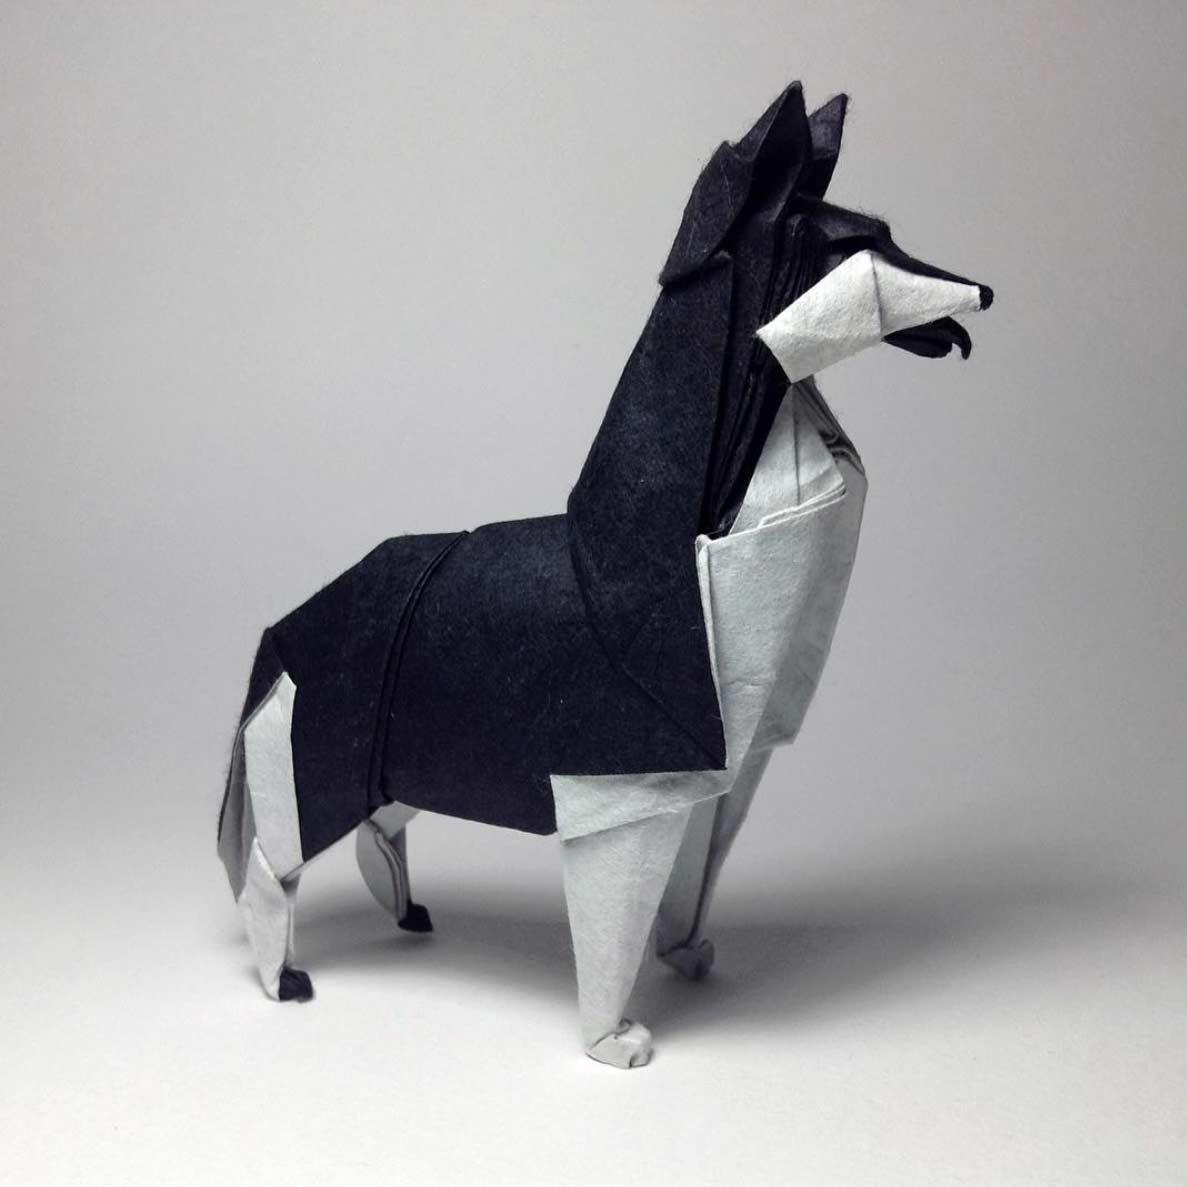 Geniale Origami-Kunstwerke von Robby Kraft Robby-Kraft-Origami_07